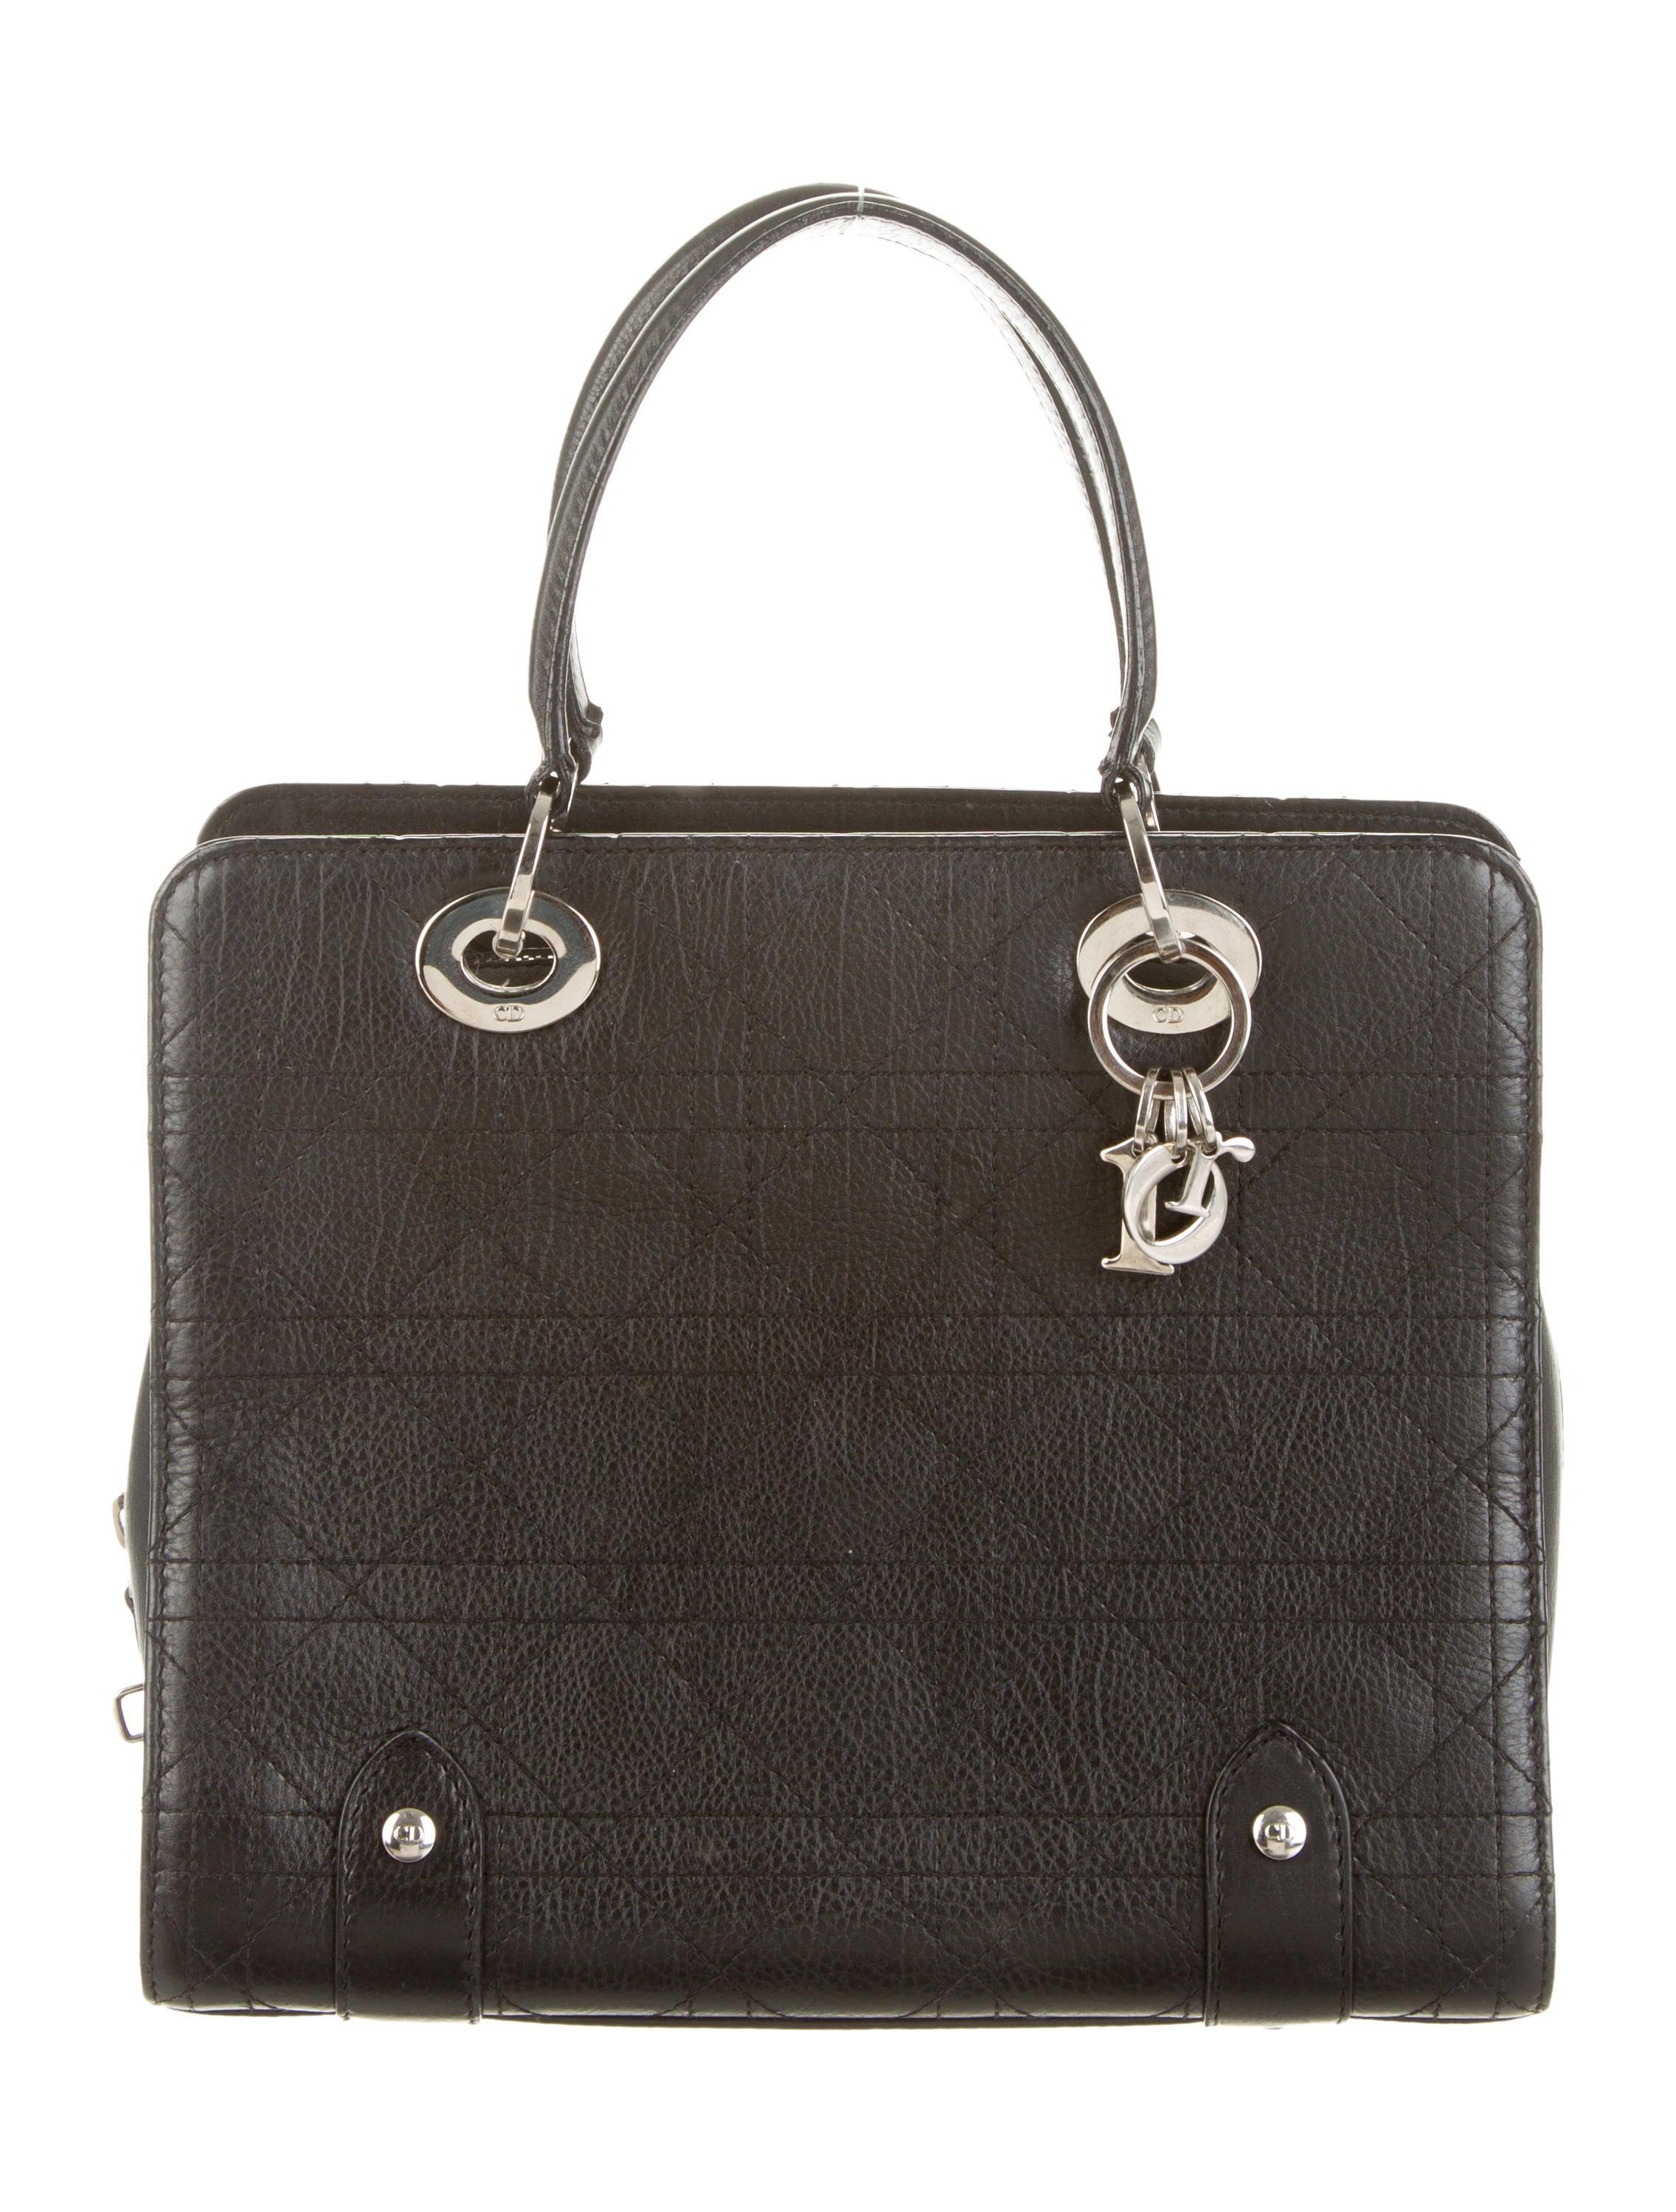 Awesome Dior Women Bags  Dior Granville Collection  All Handbag